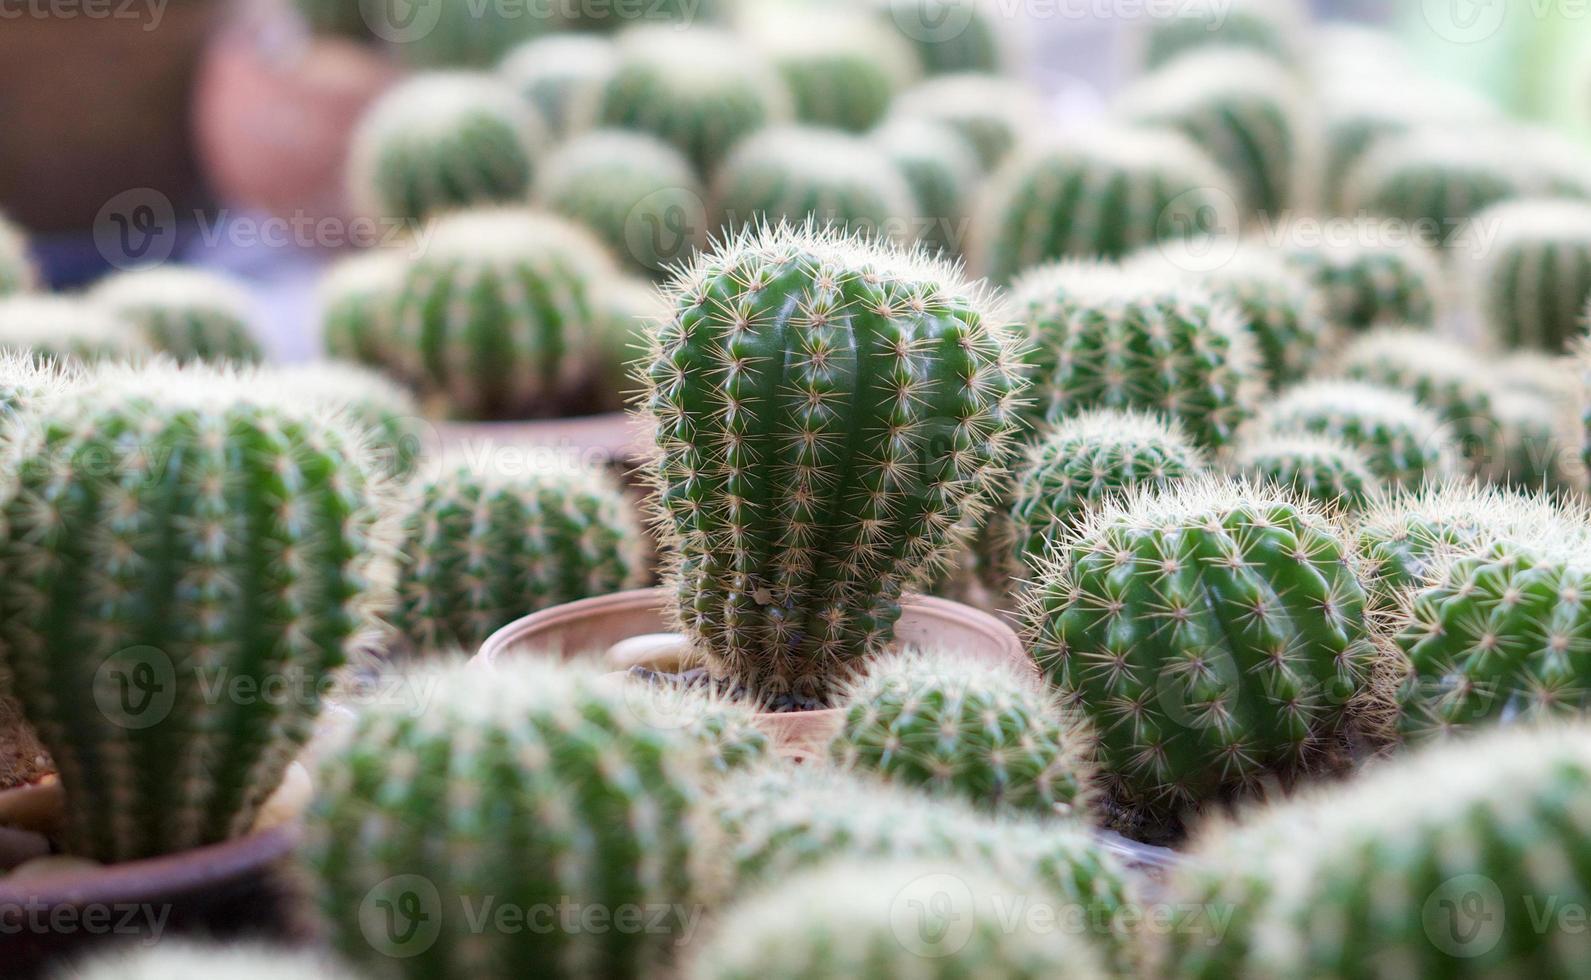 grön kaktus med nålmönster foto